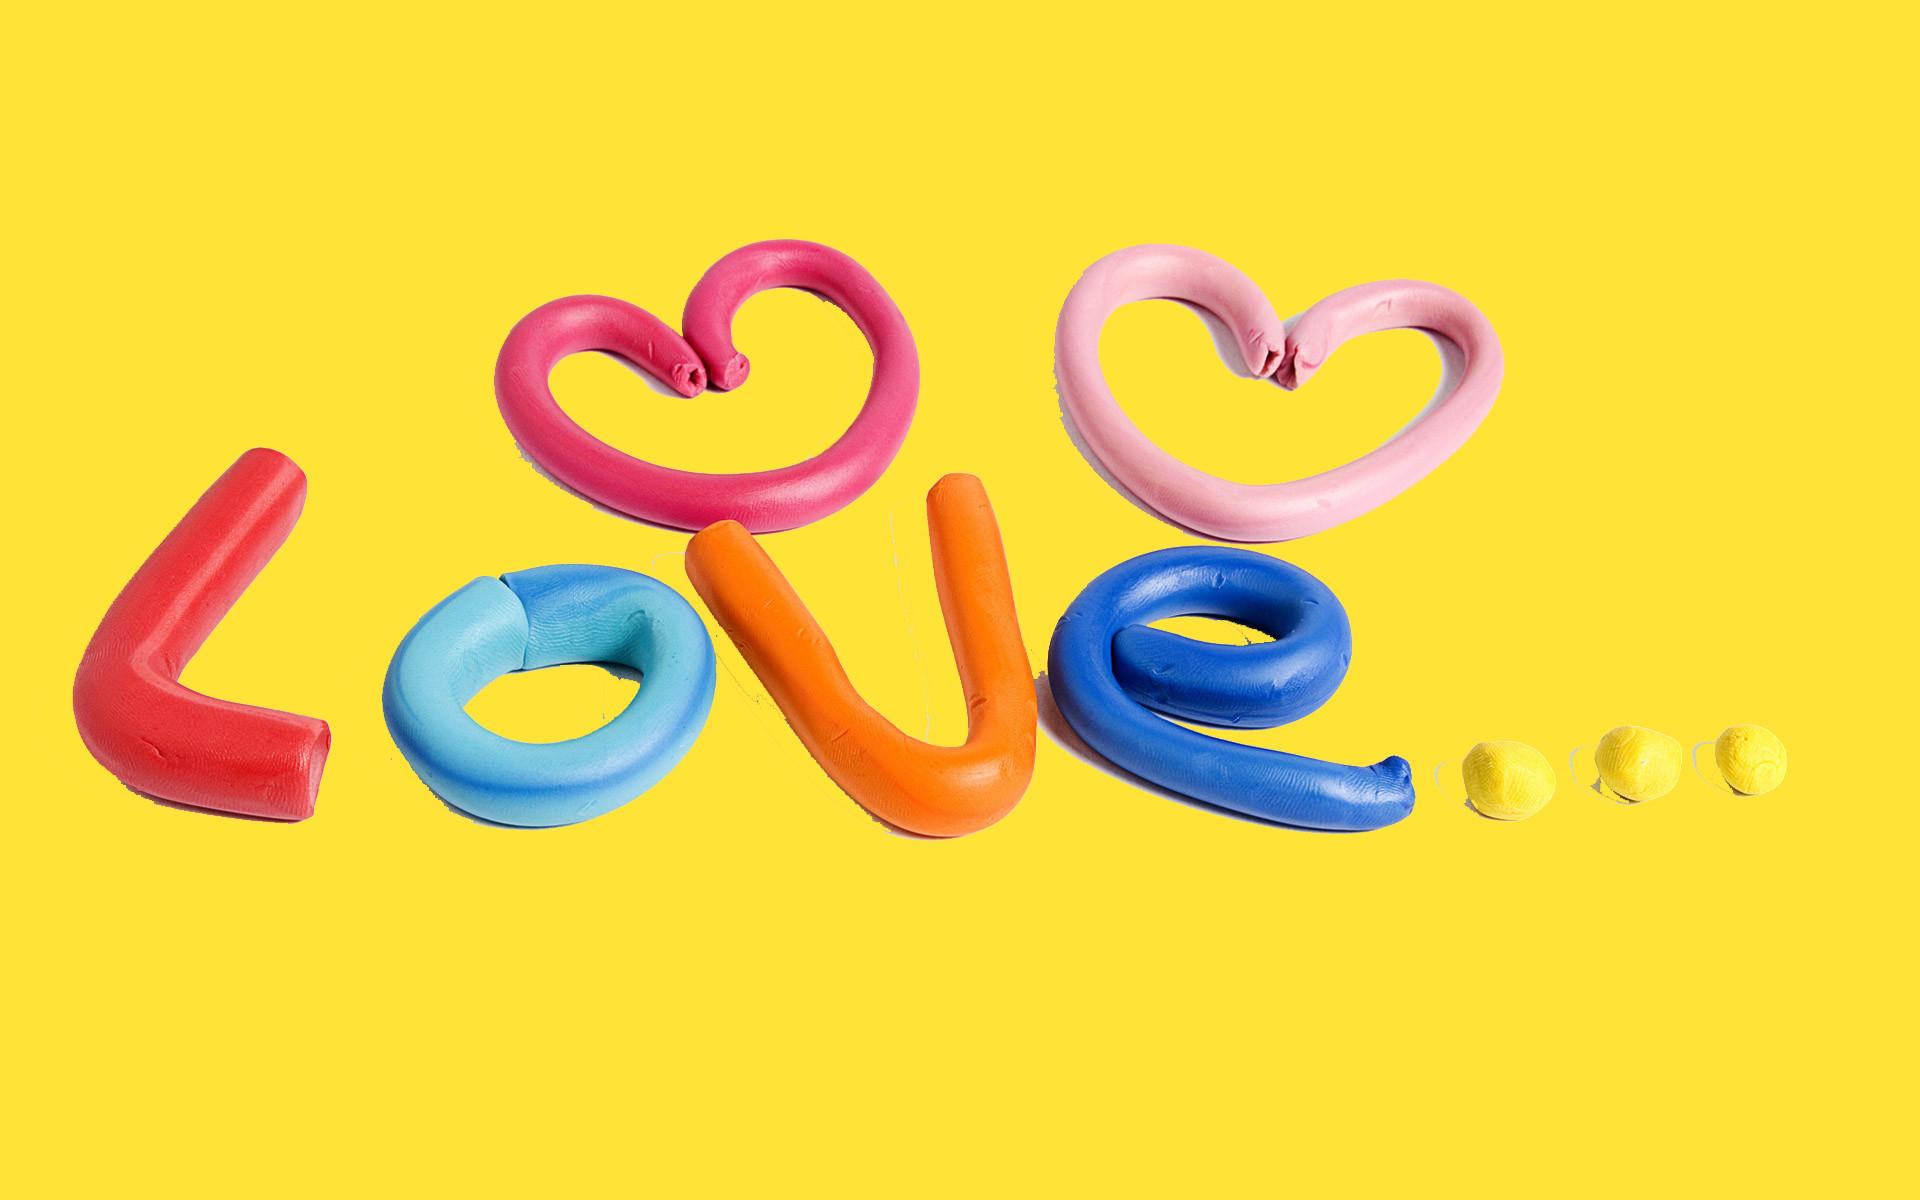 Cute Art Love Yellow Background Desktop.